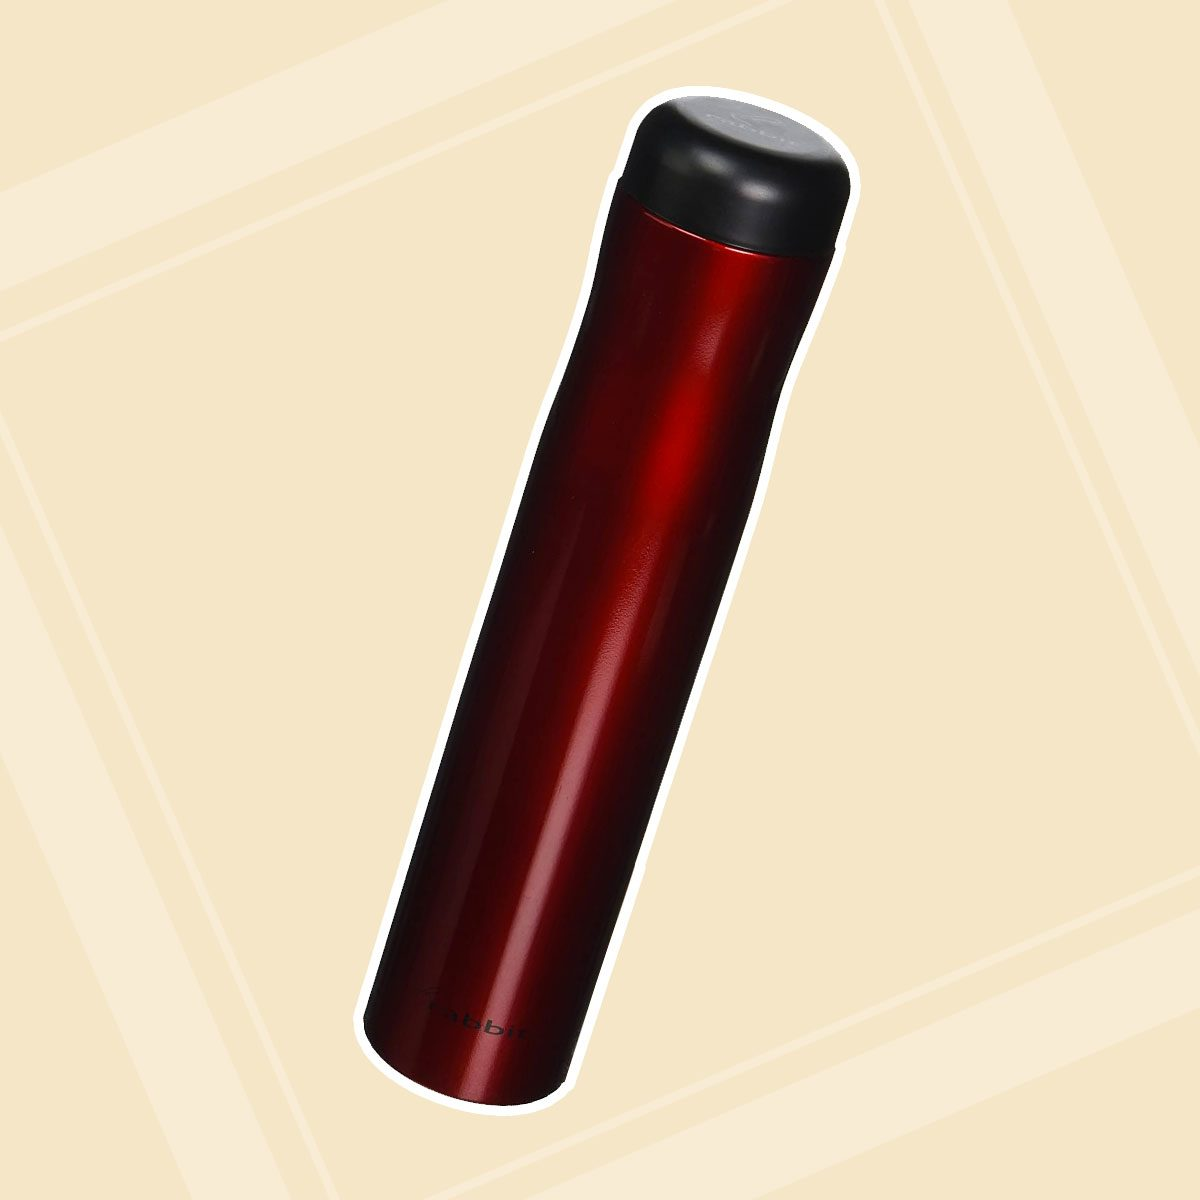 Rabbit Automatic Electric Corkscrew Wine Bottle Opener